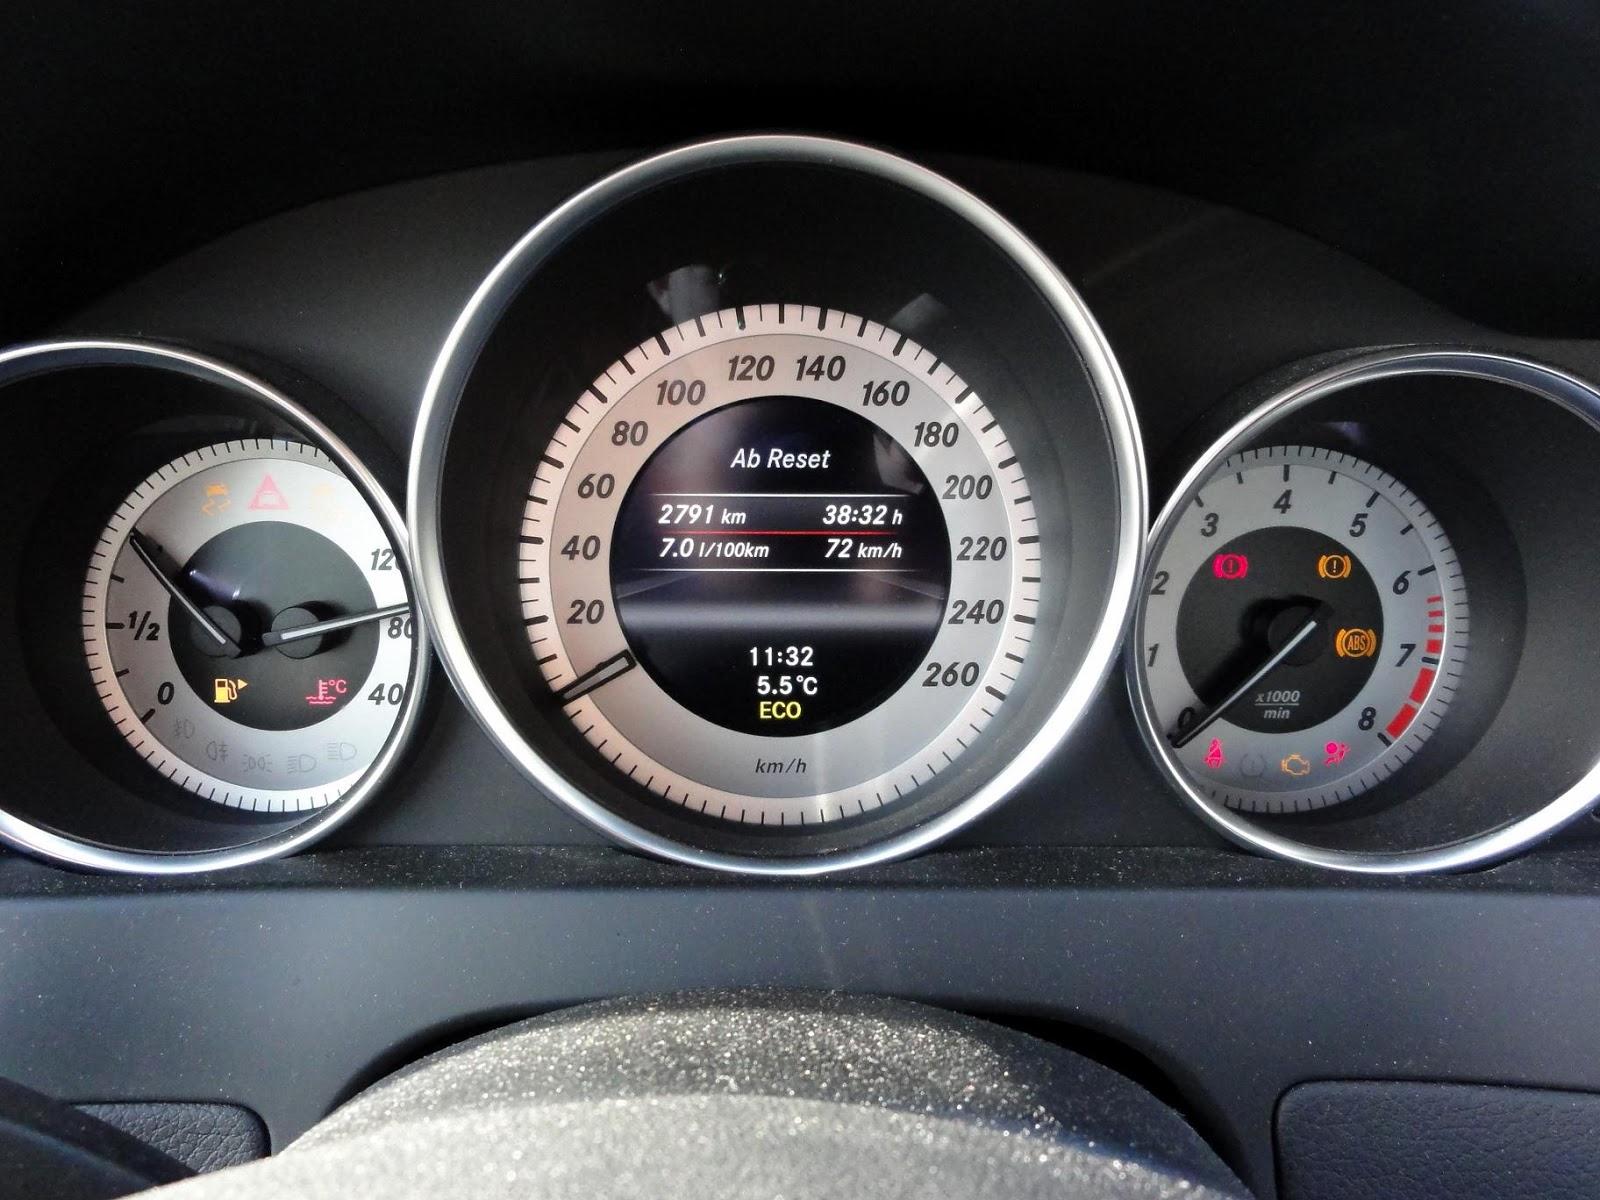 guitigefilmpjes: fuel consumption: mercedes benz c180 - 1595 cm³